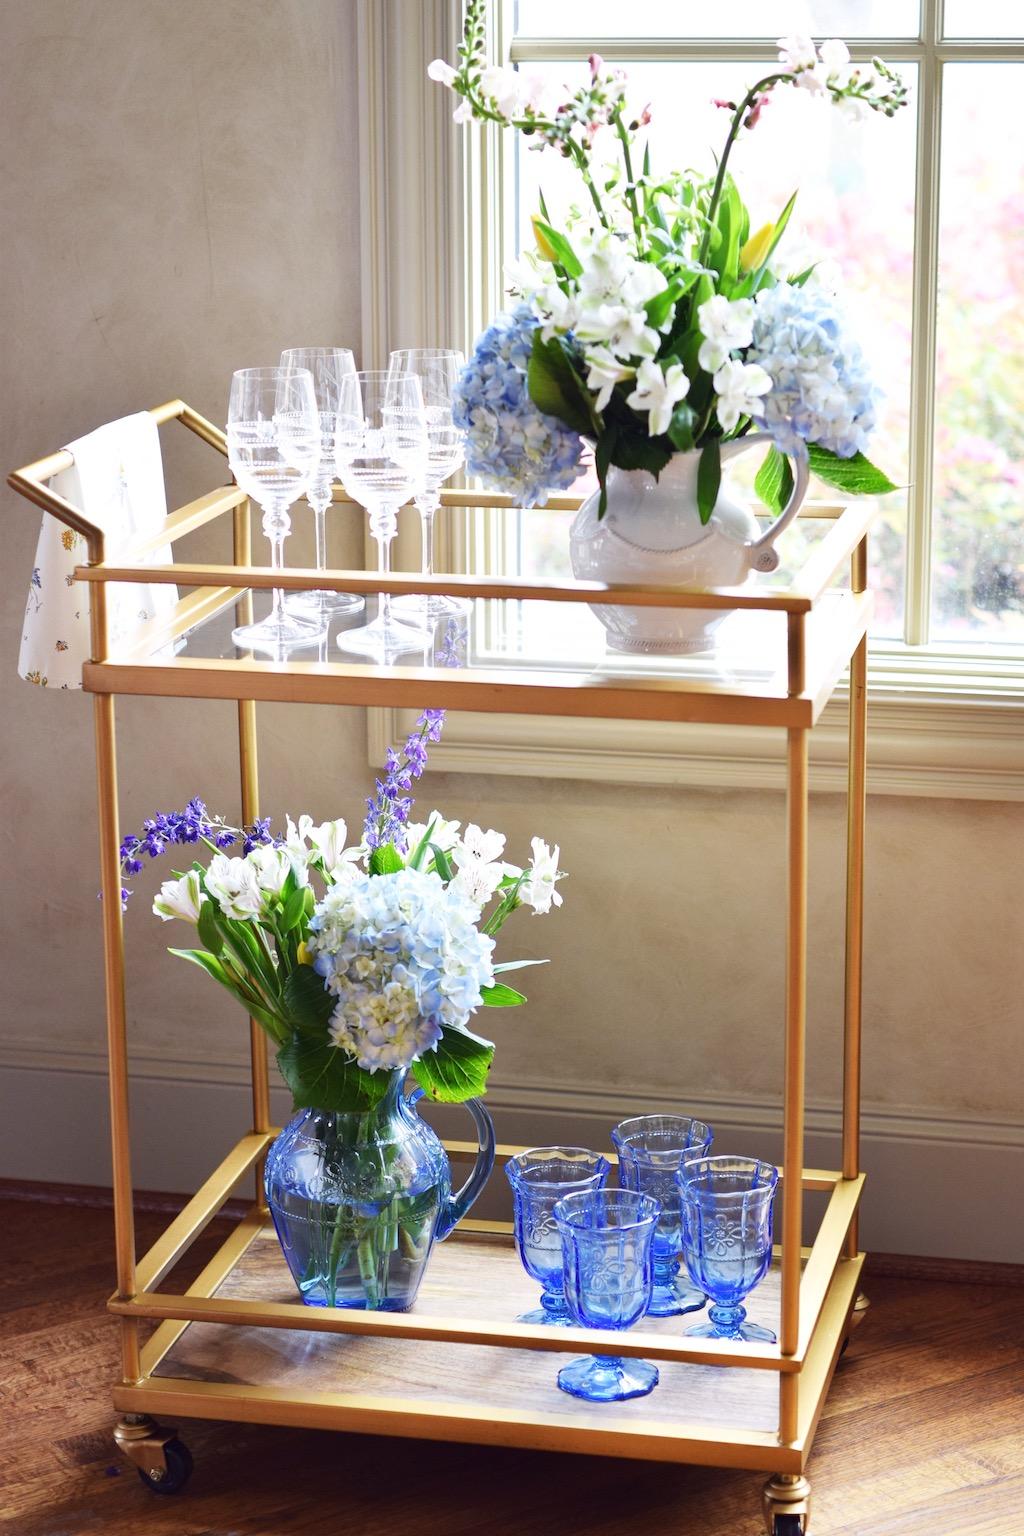 Spring Inspired Bar Cart | Interior Decor| The Darling Petite Diva